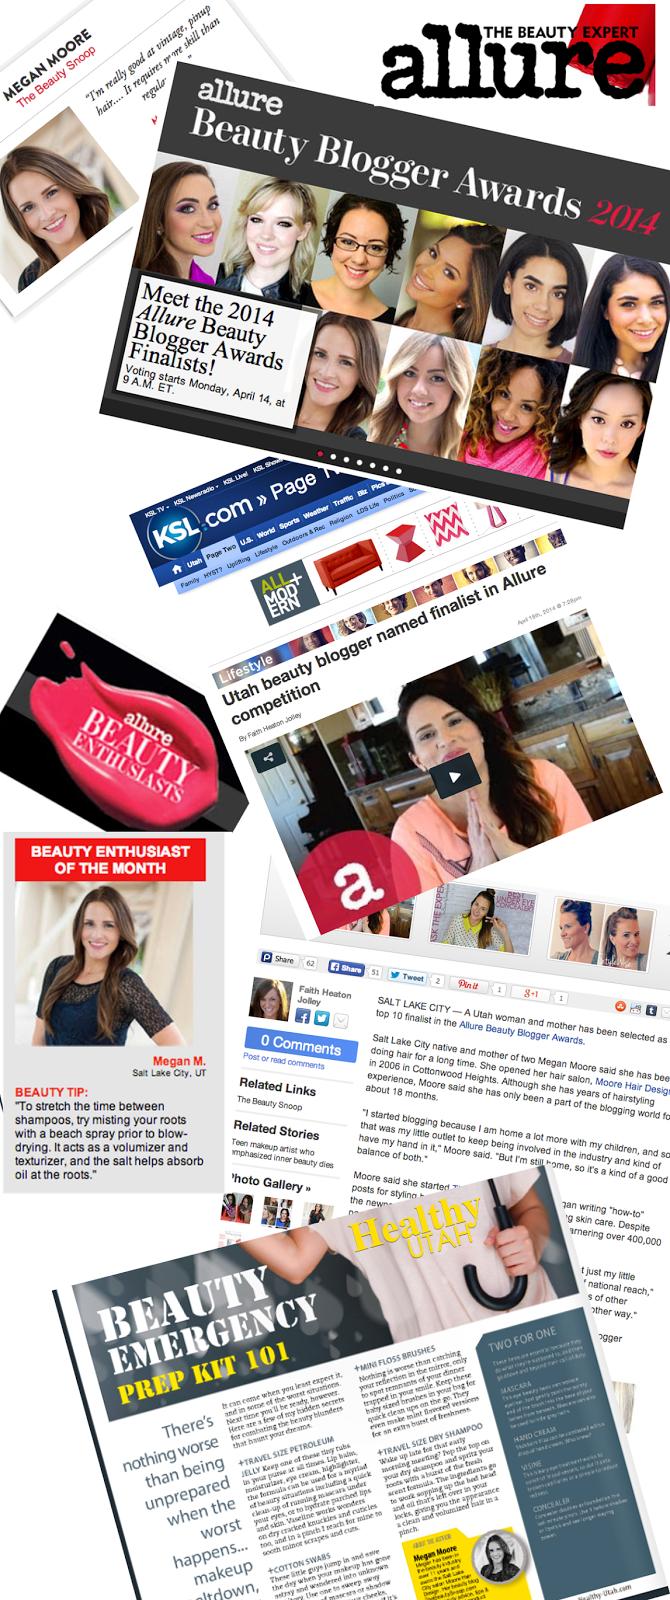 Top beauty blogs, Allure Magazine Beauty Blogger of the Year, Best Beauty blogs, Beauty Blogs to Follow